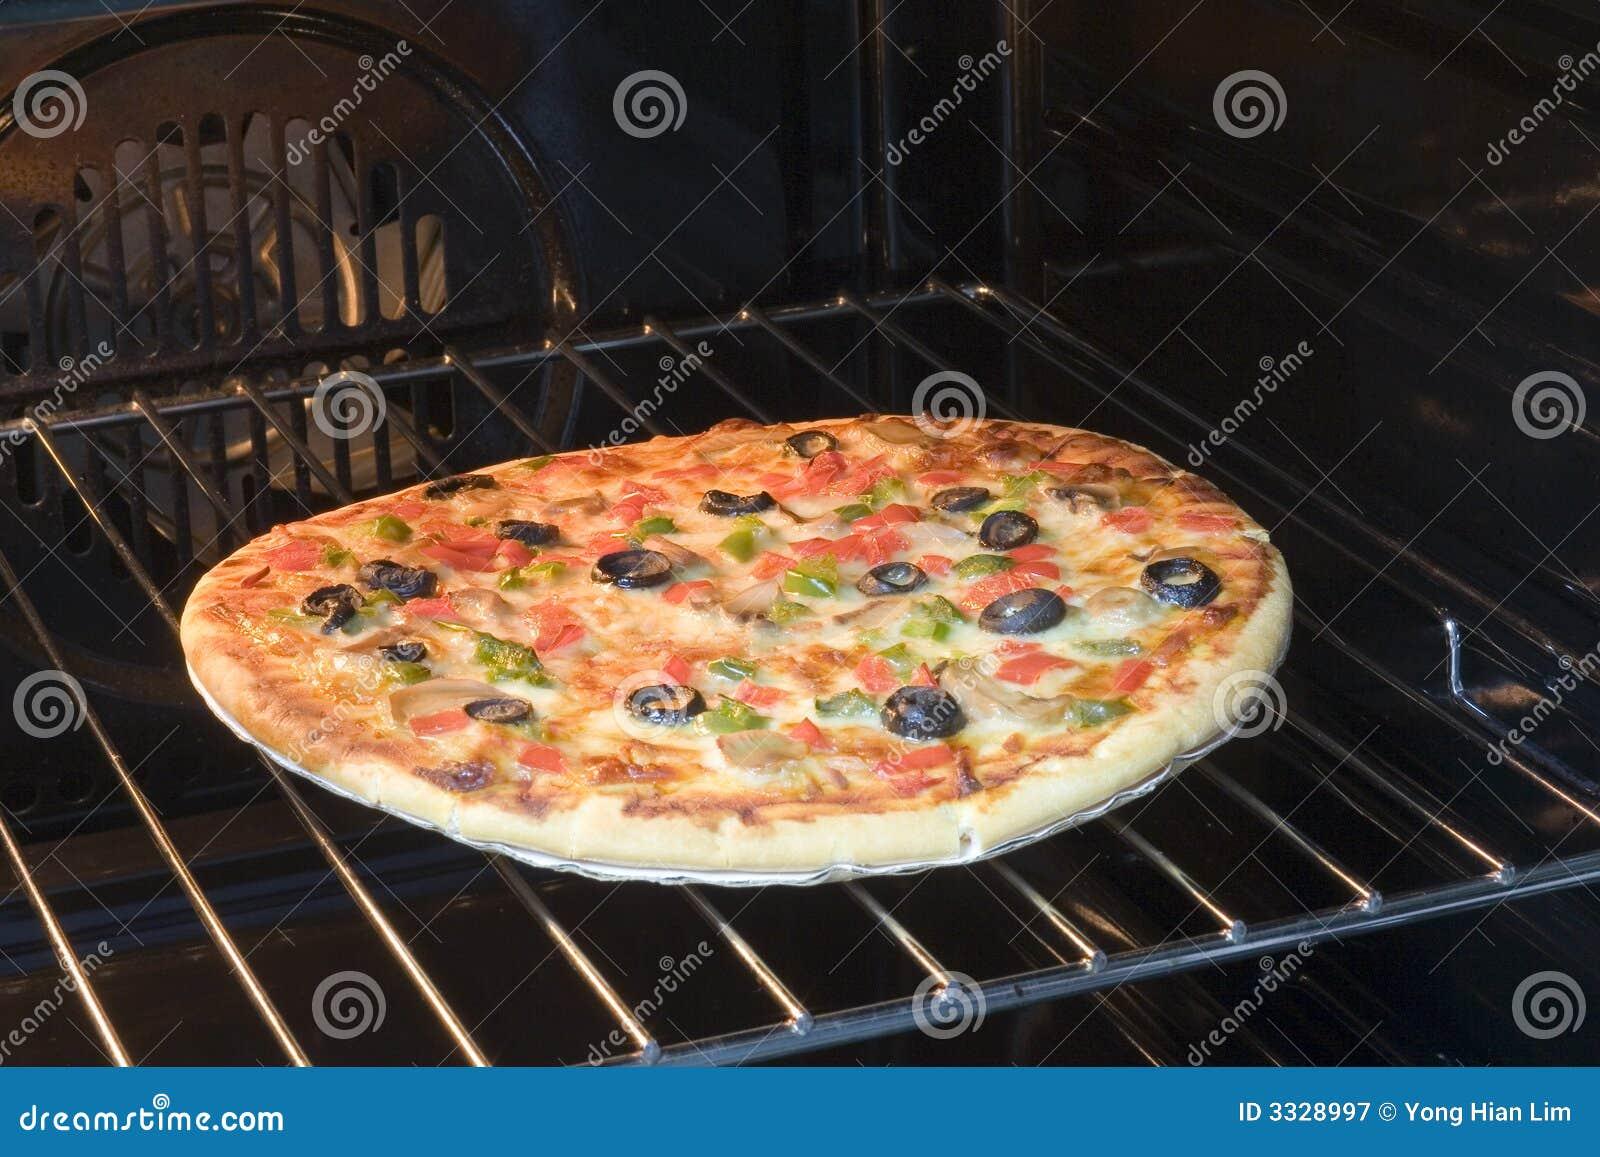 Pizza In De Oven.Vegetarian Pizza In Oven Stock Image Image Of Lunch Dinner